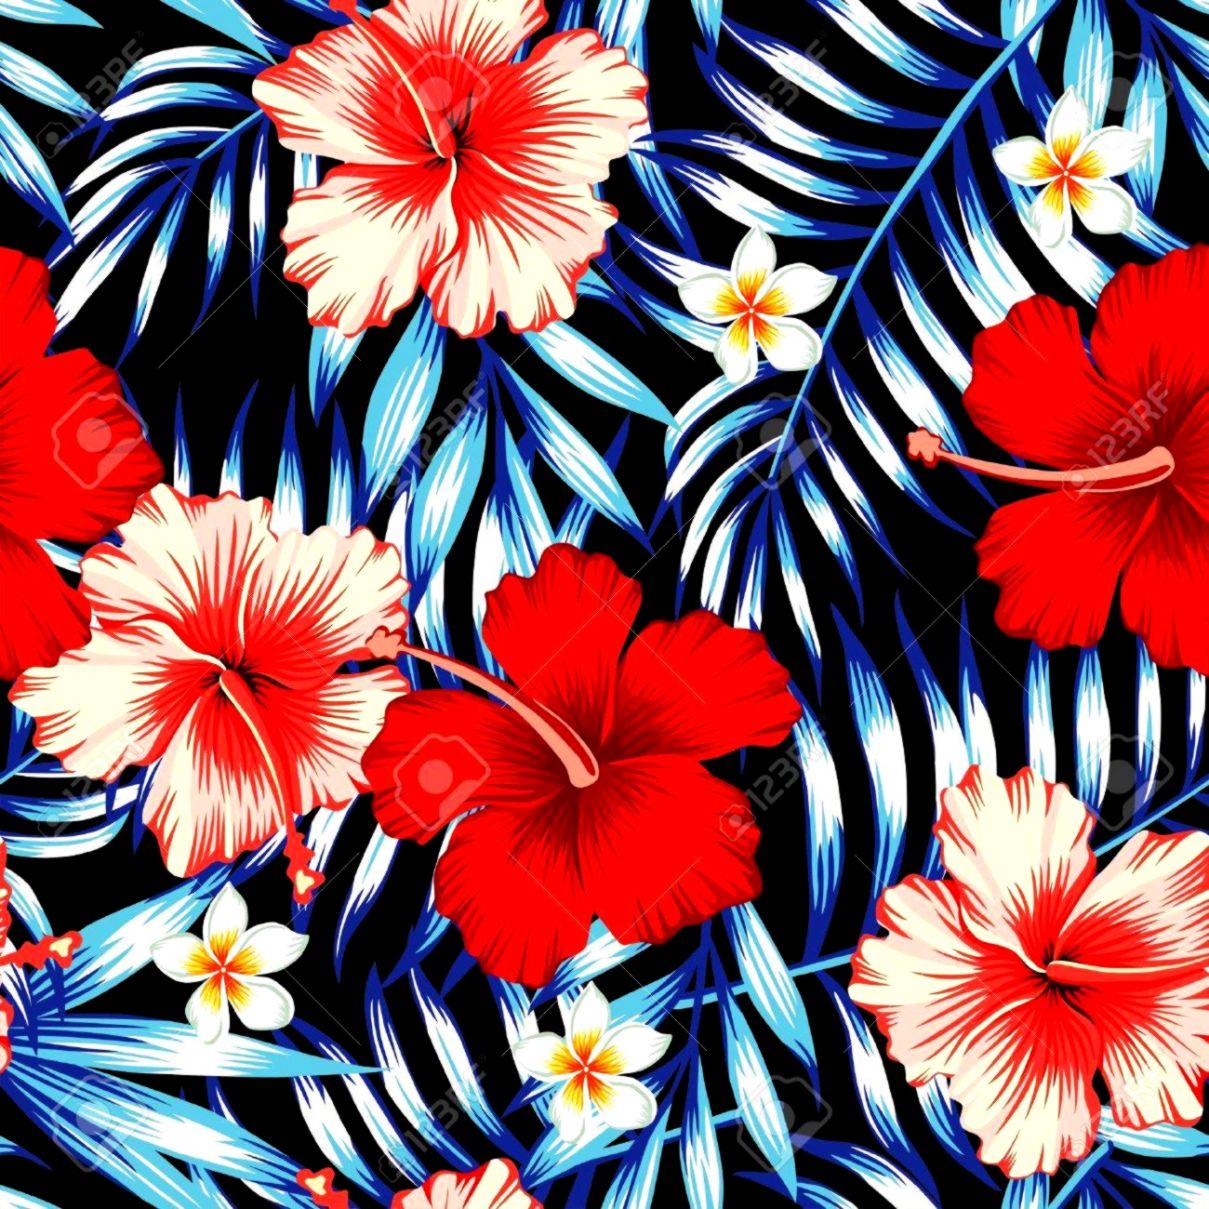 Hawaiian Flower Wallpaper Iphone The Galleries Of Hd